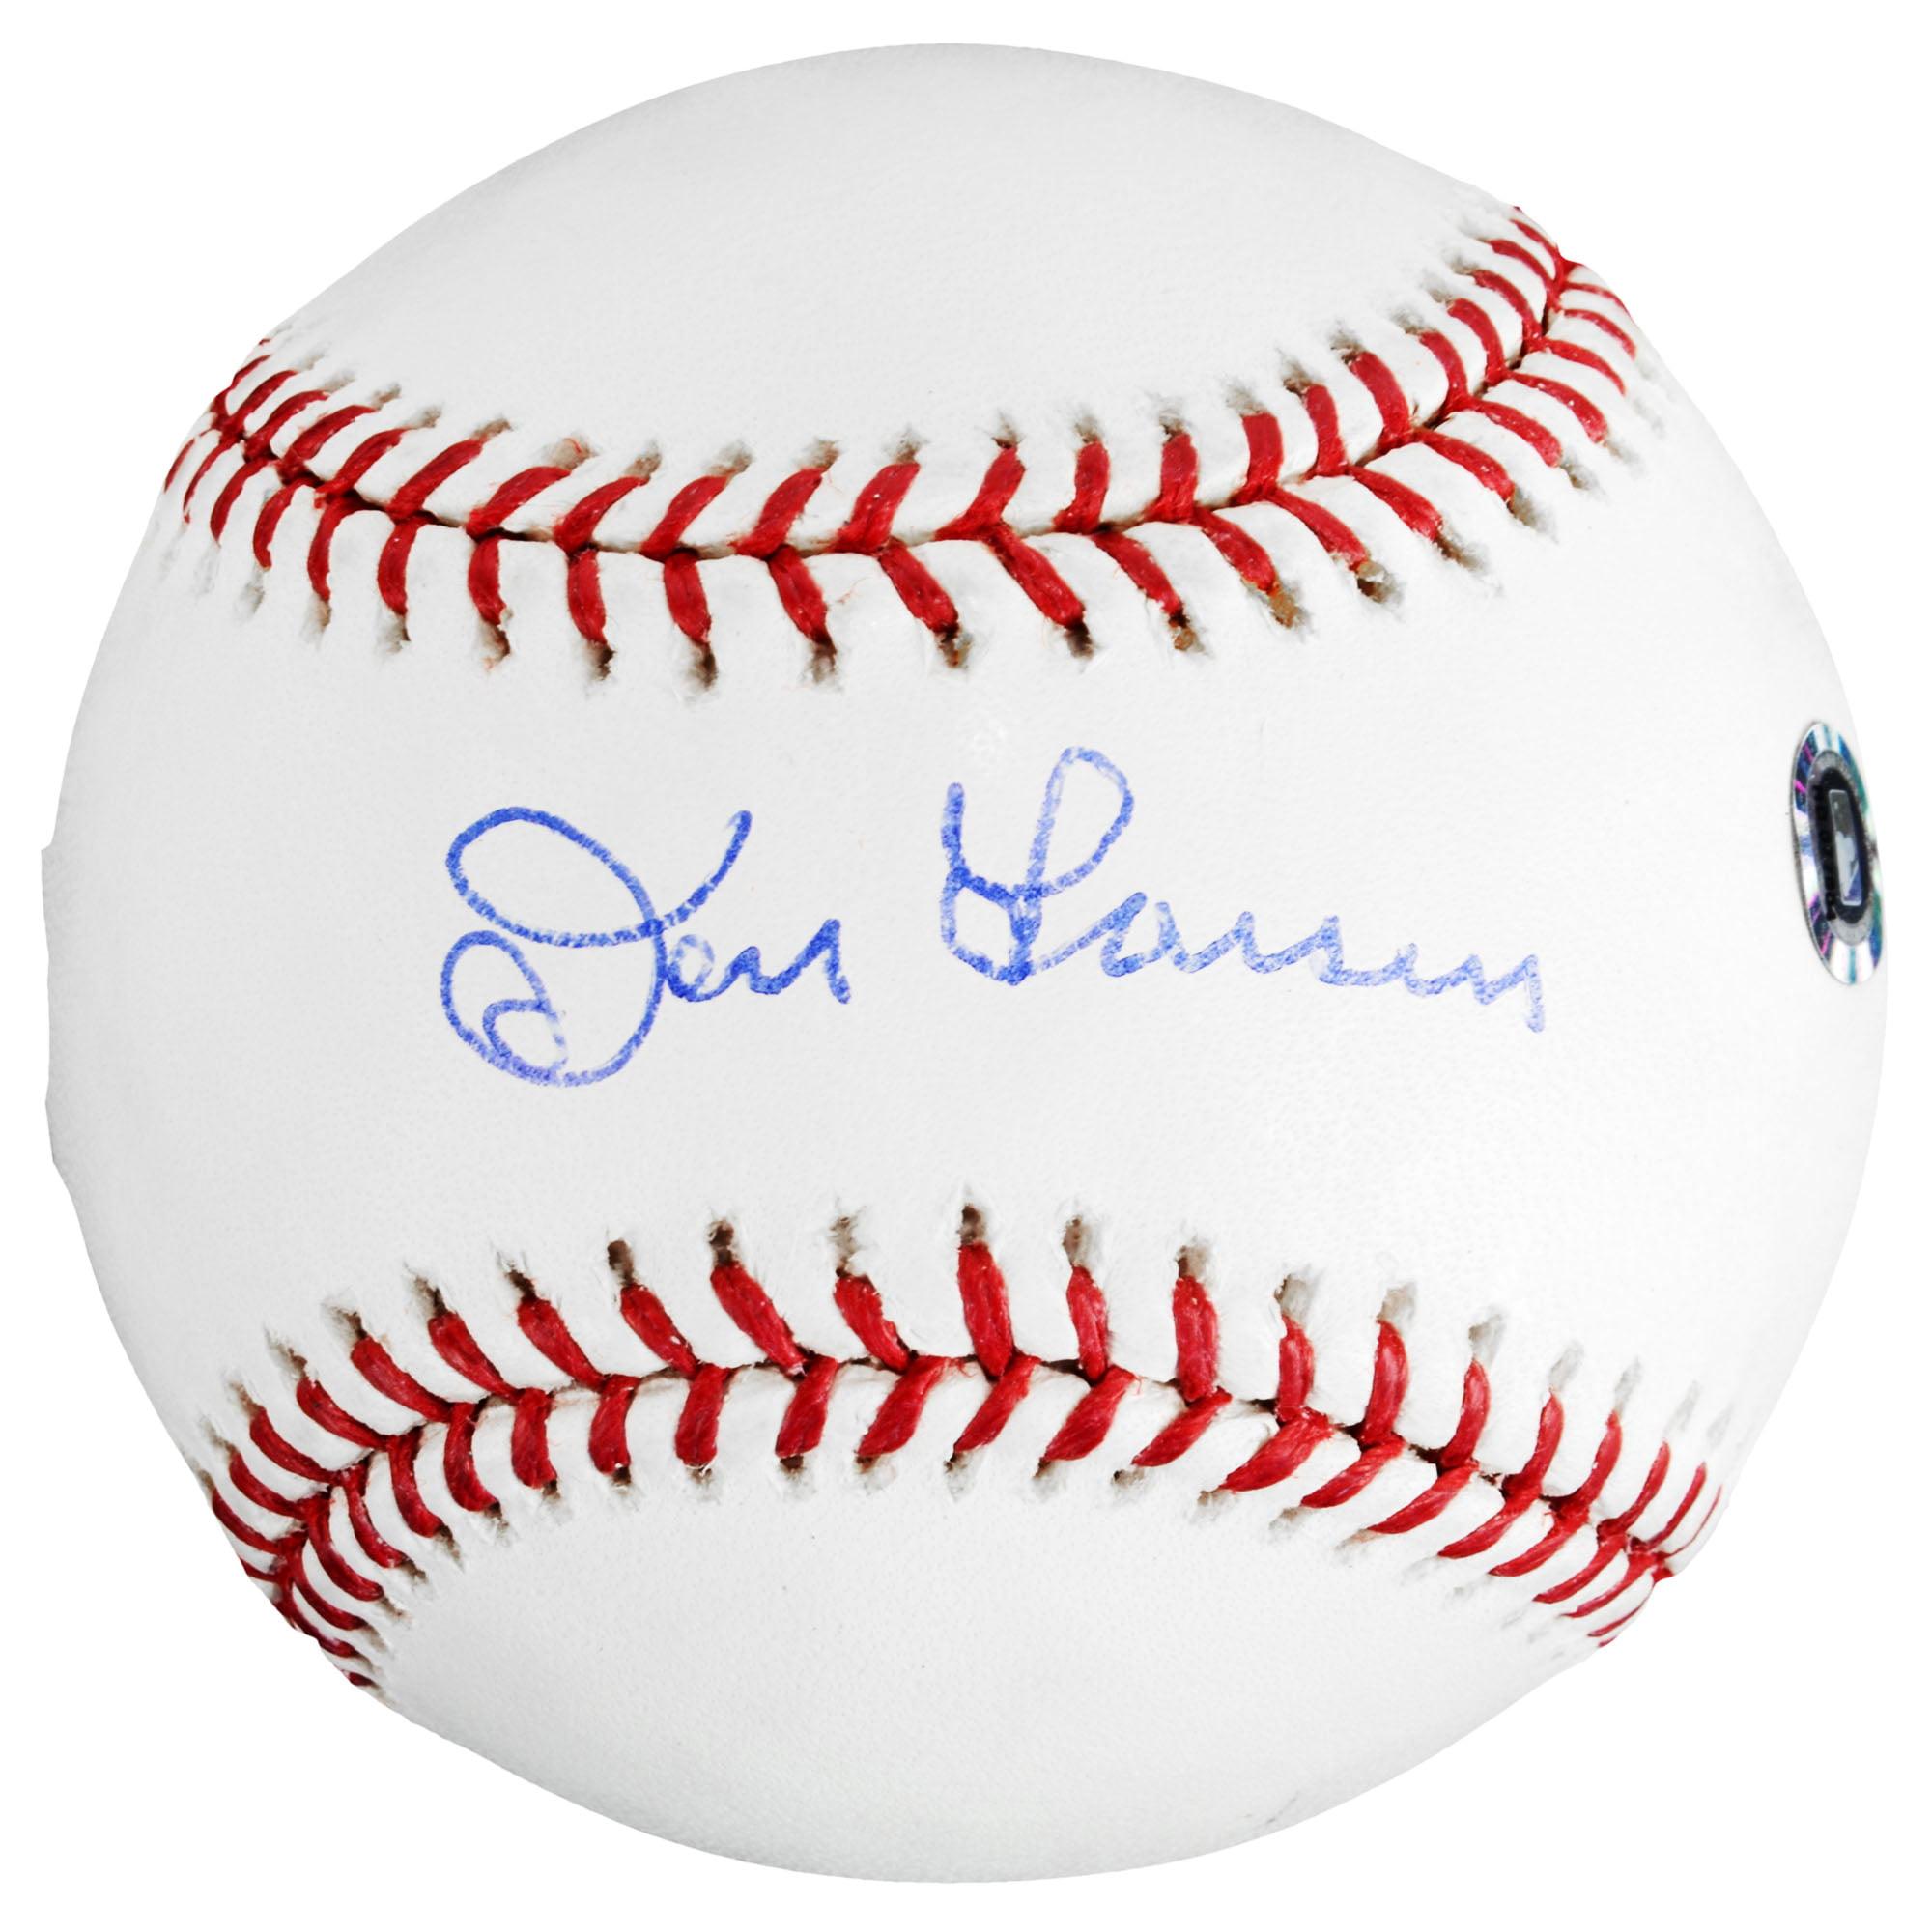 Don Larsen New York Yankees Fanatics Authentic Autographed Baseball - No Size